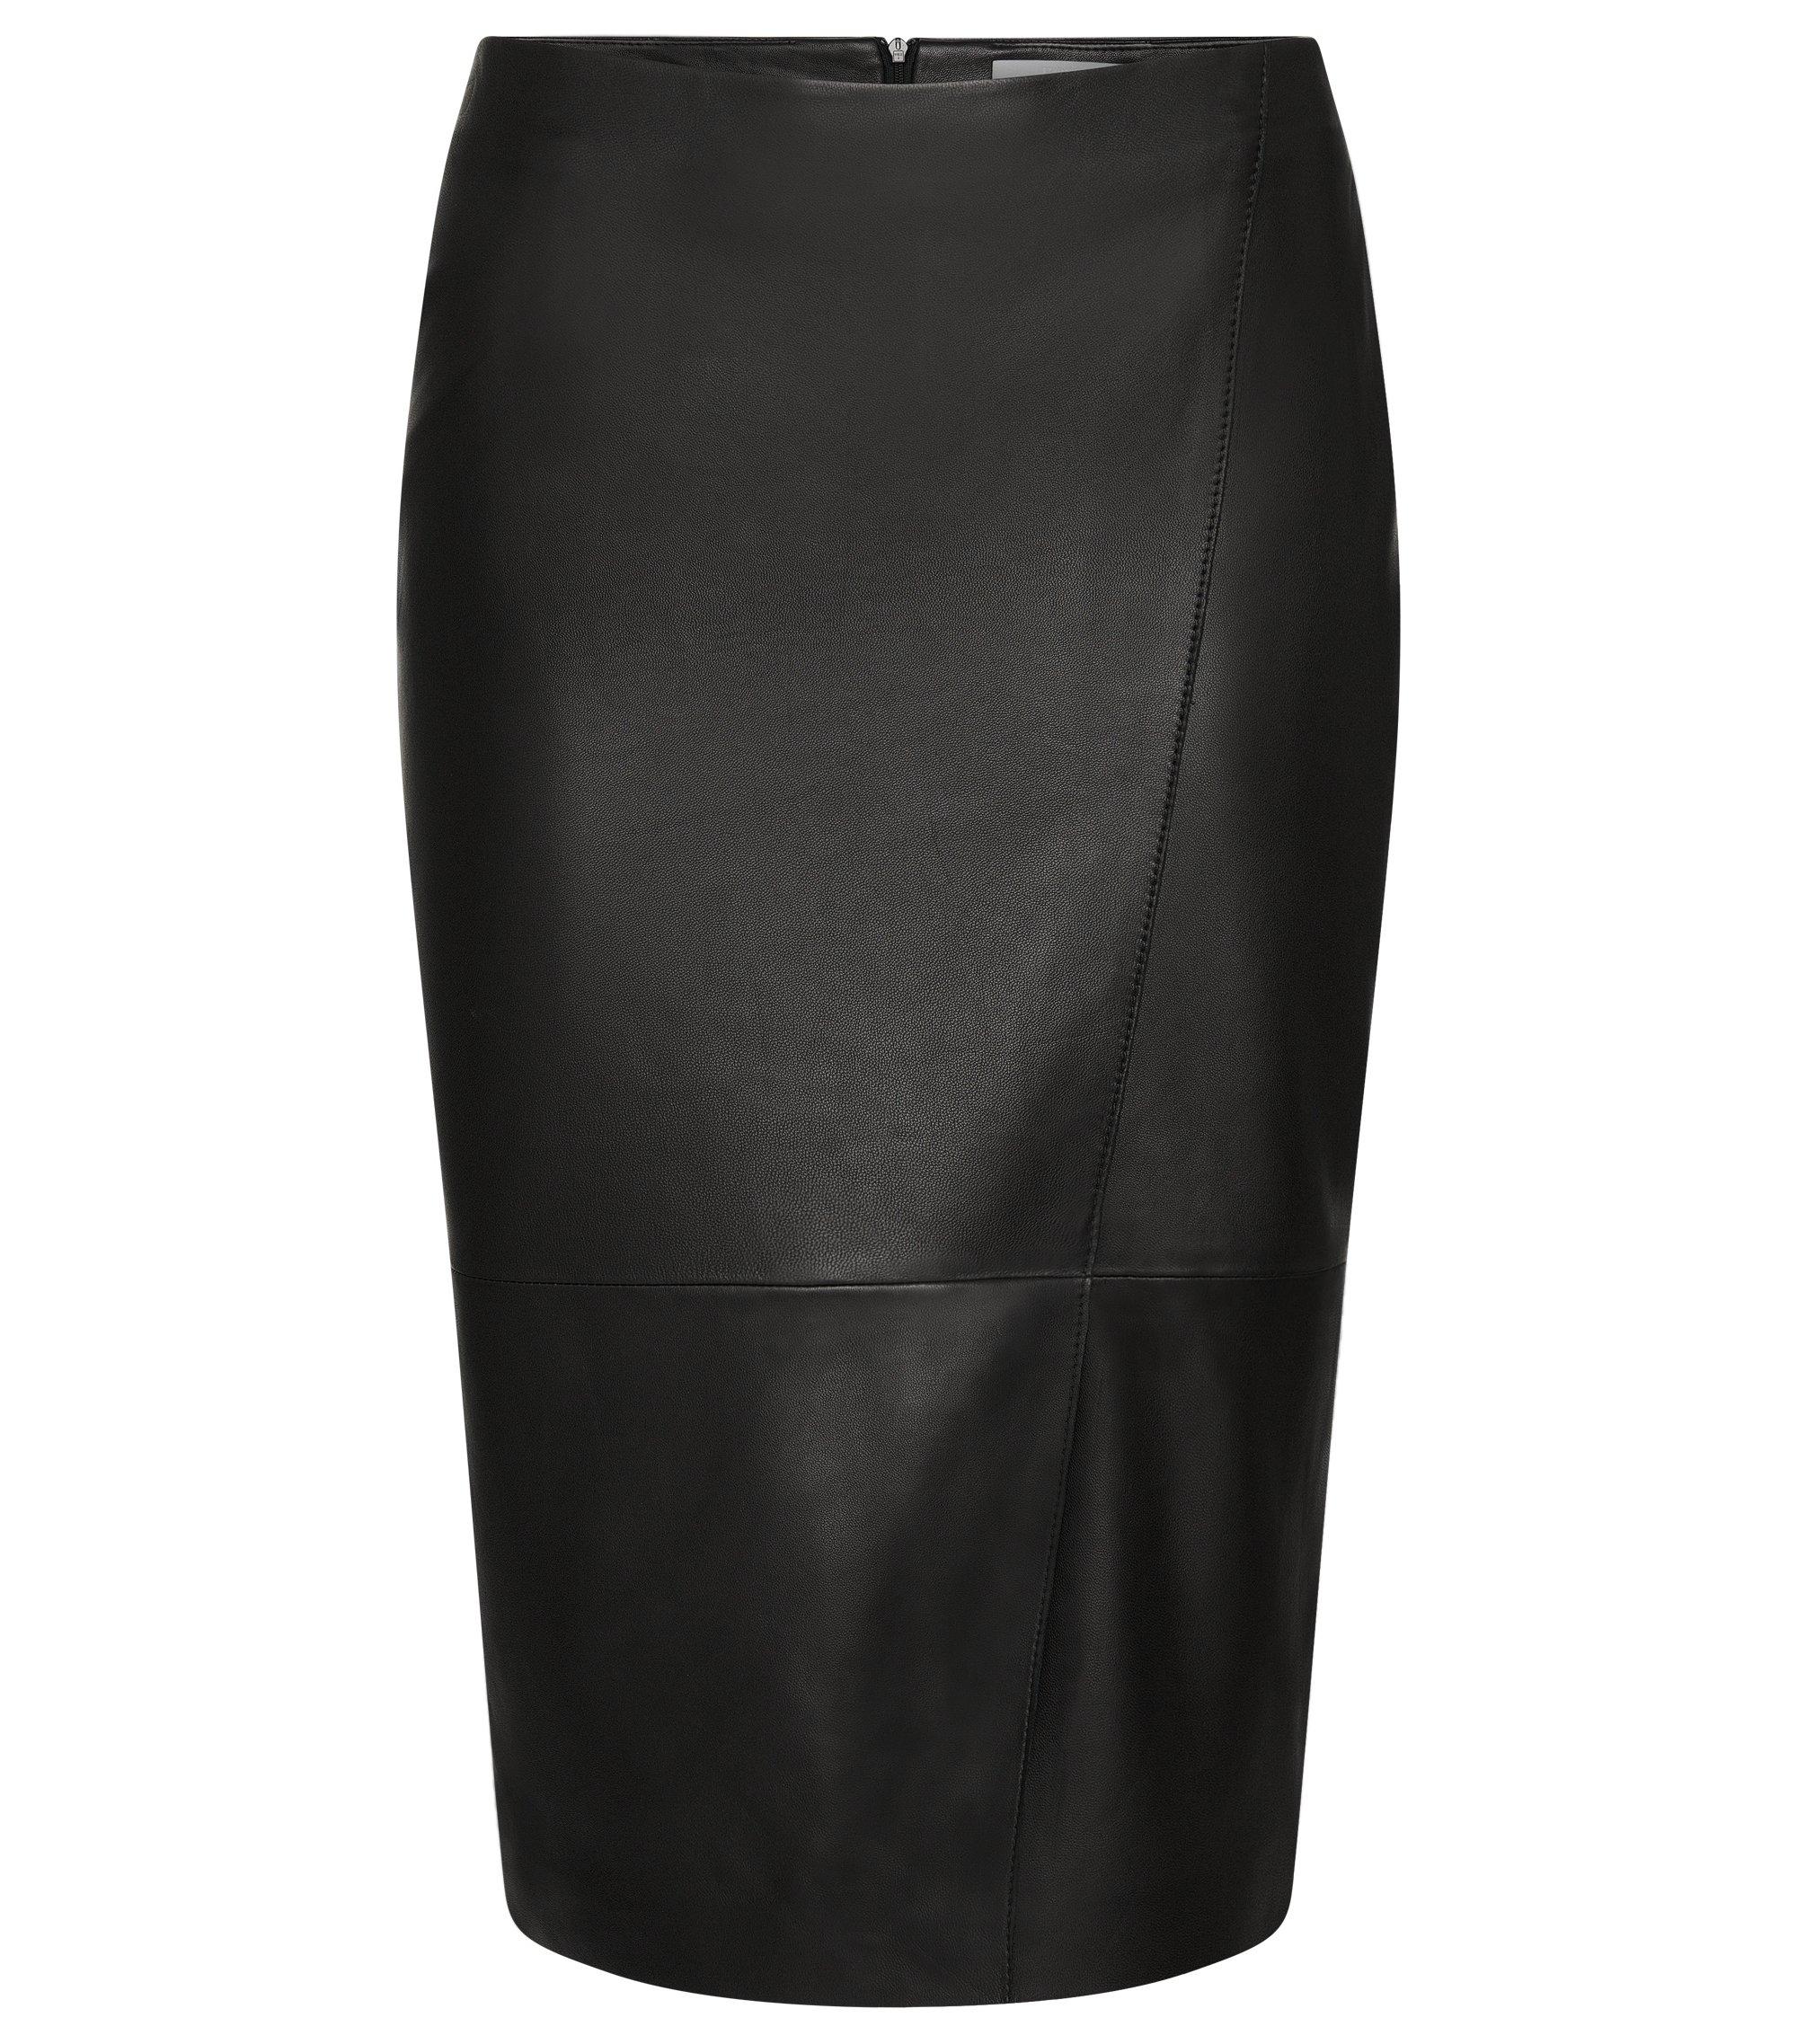 Lambskin Asymmetrical Pencil Skirt | Seylise, Black